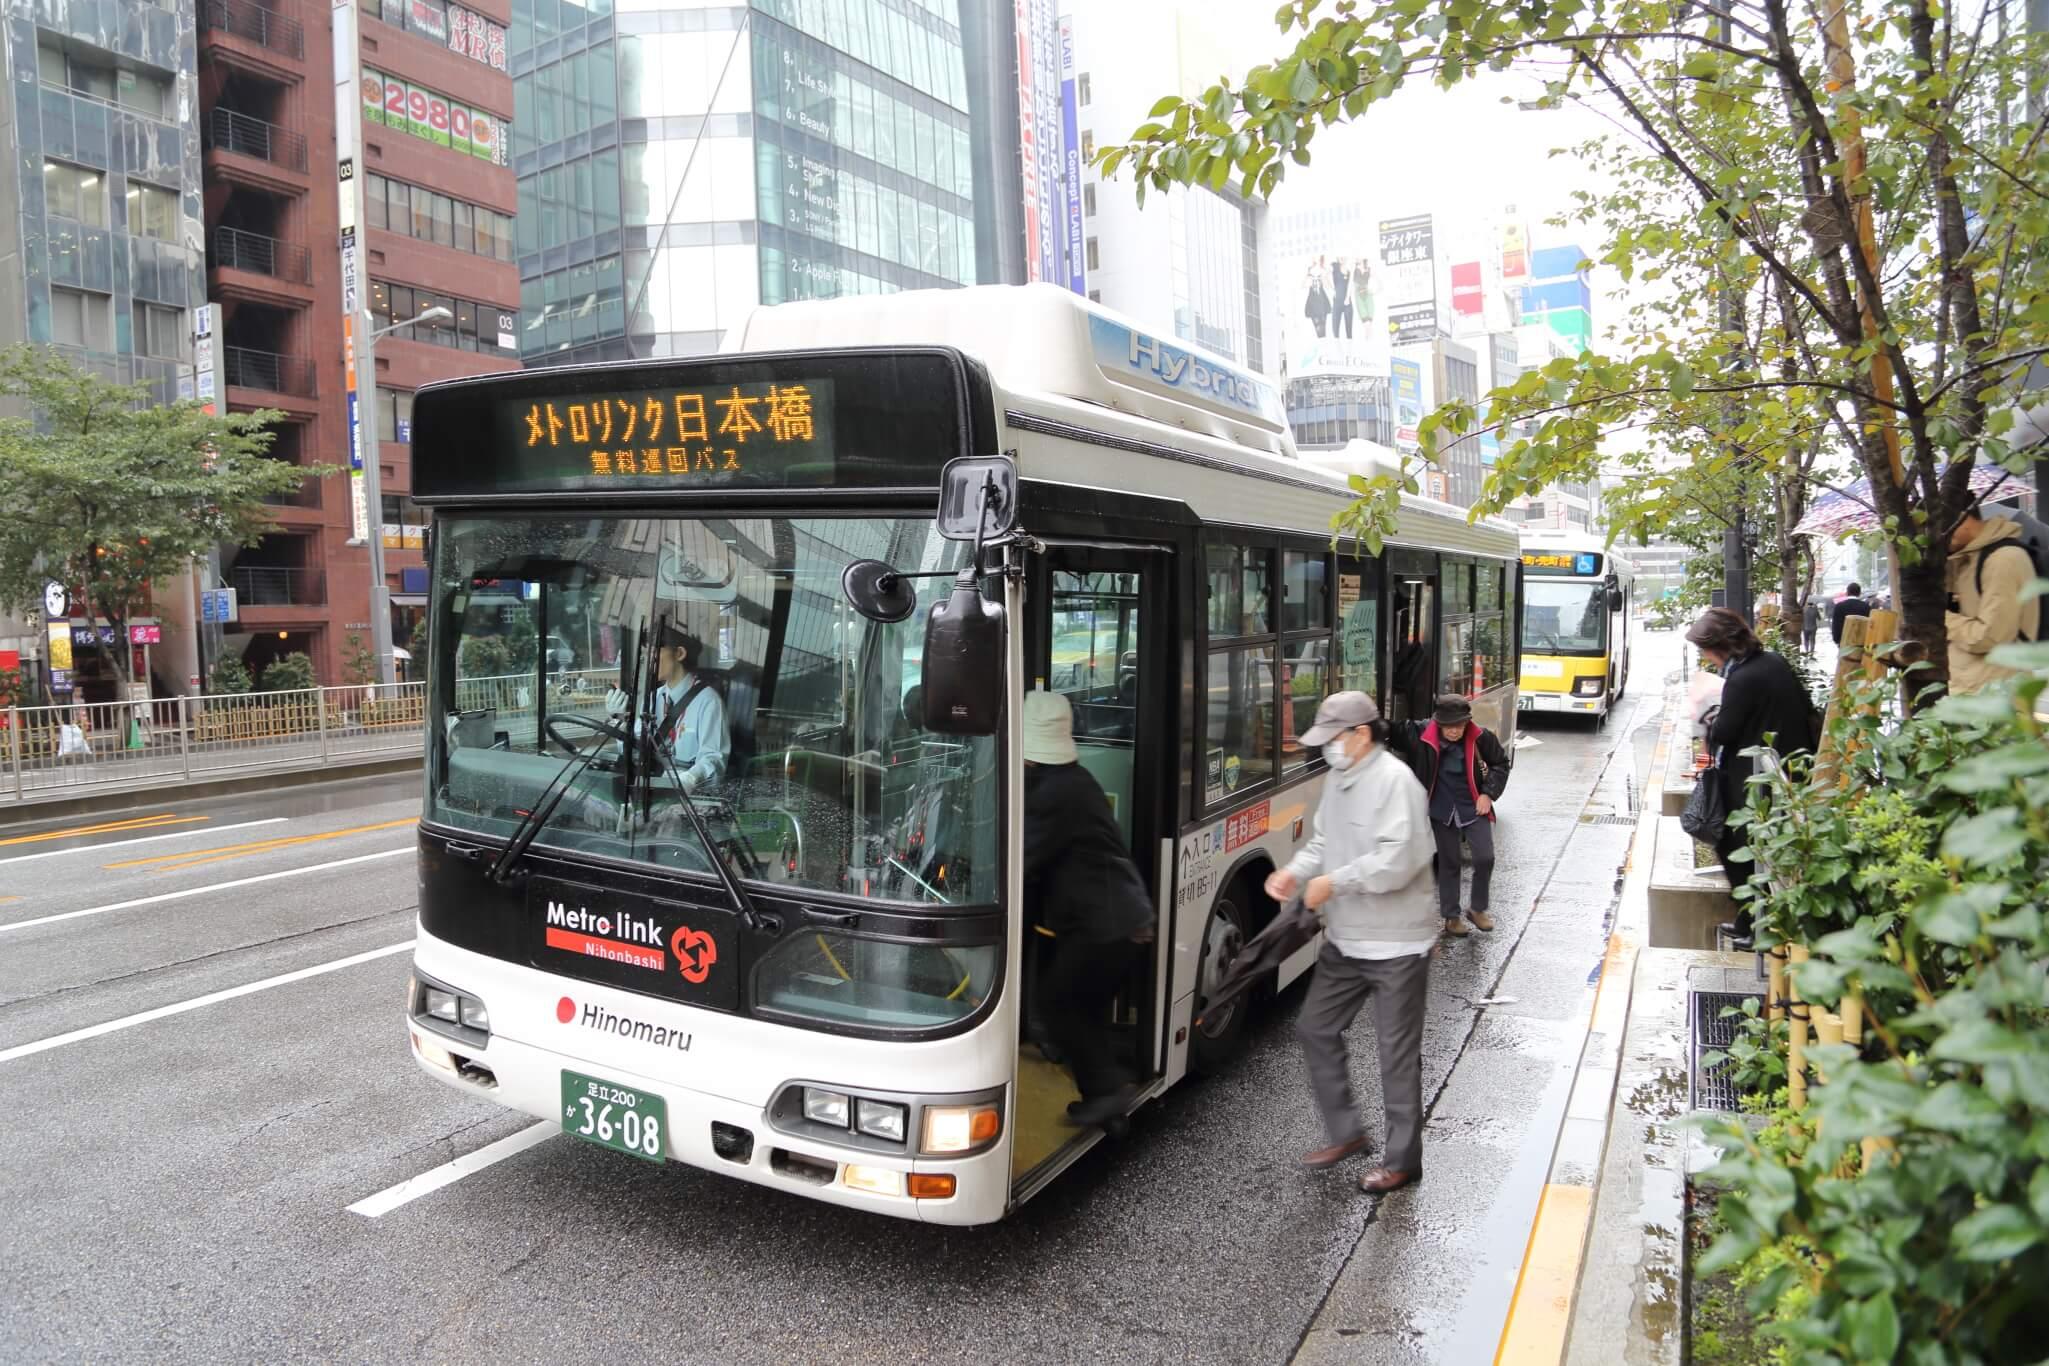 Photo of お買い物・観光の足に最適!無料巡回バス「メトロリンク日本橋」で巡るオススメスポット